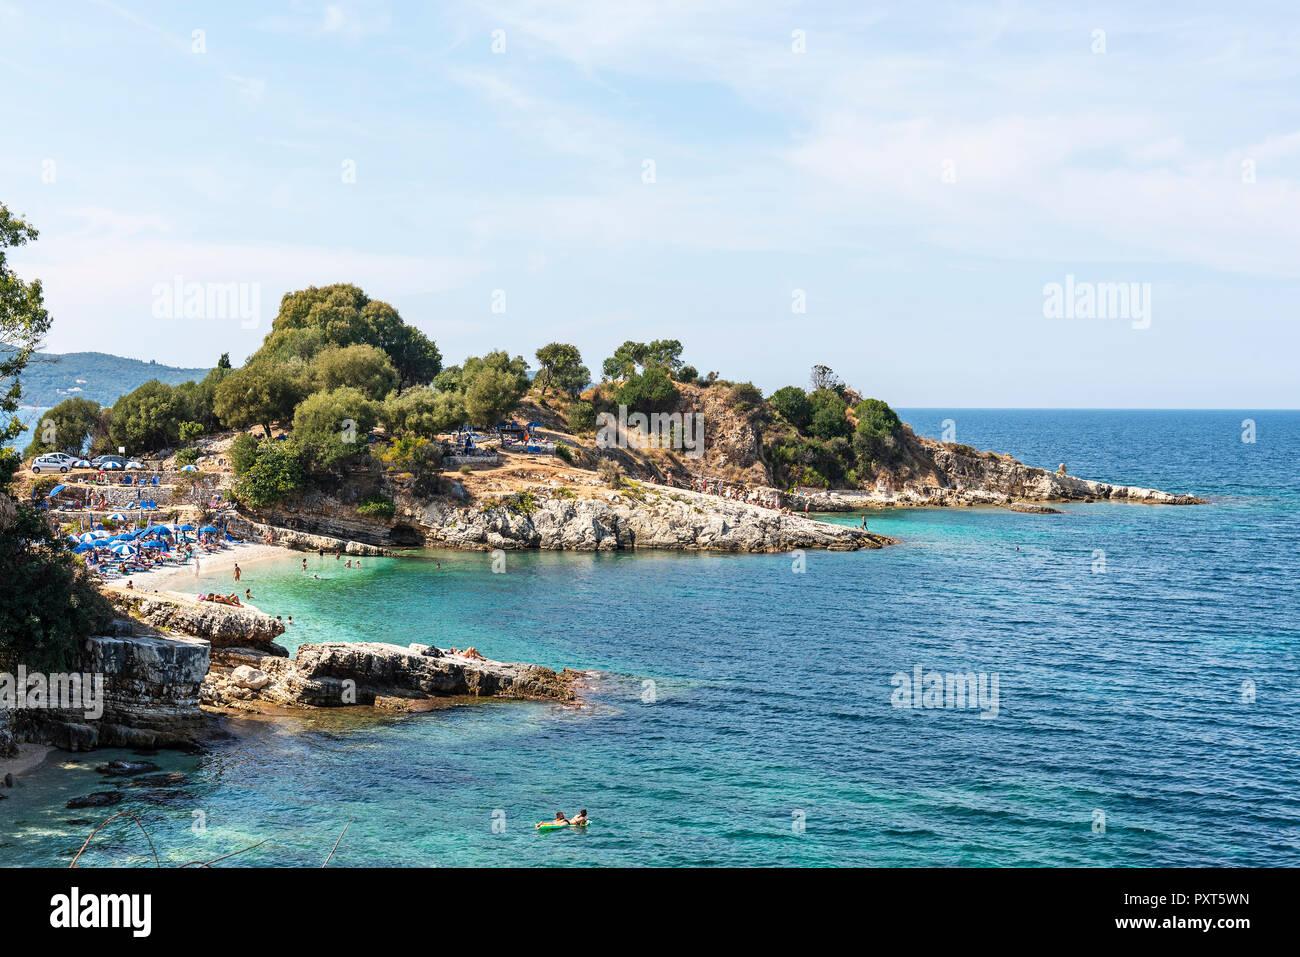 Beach, Kassiopi, Corfu Island, Ionian Islands, Mediterranean Sea, Greece - Stock Image